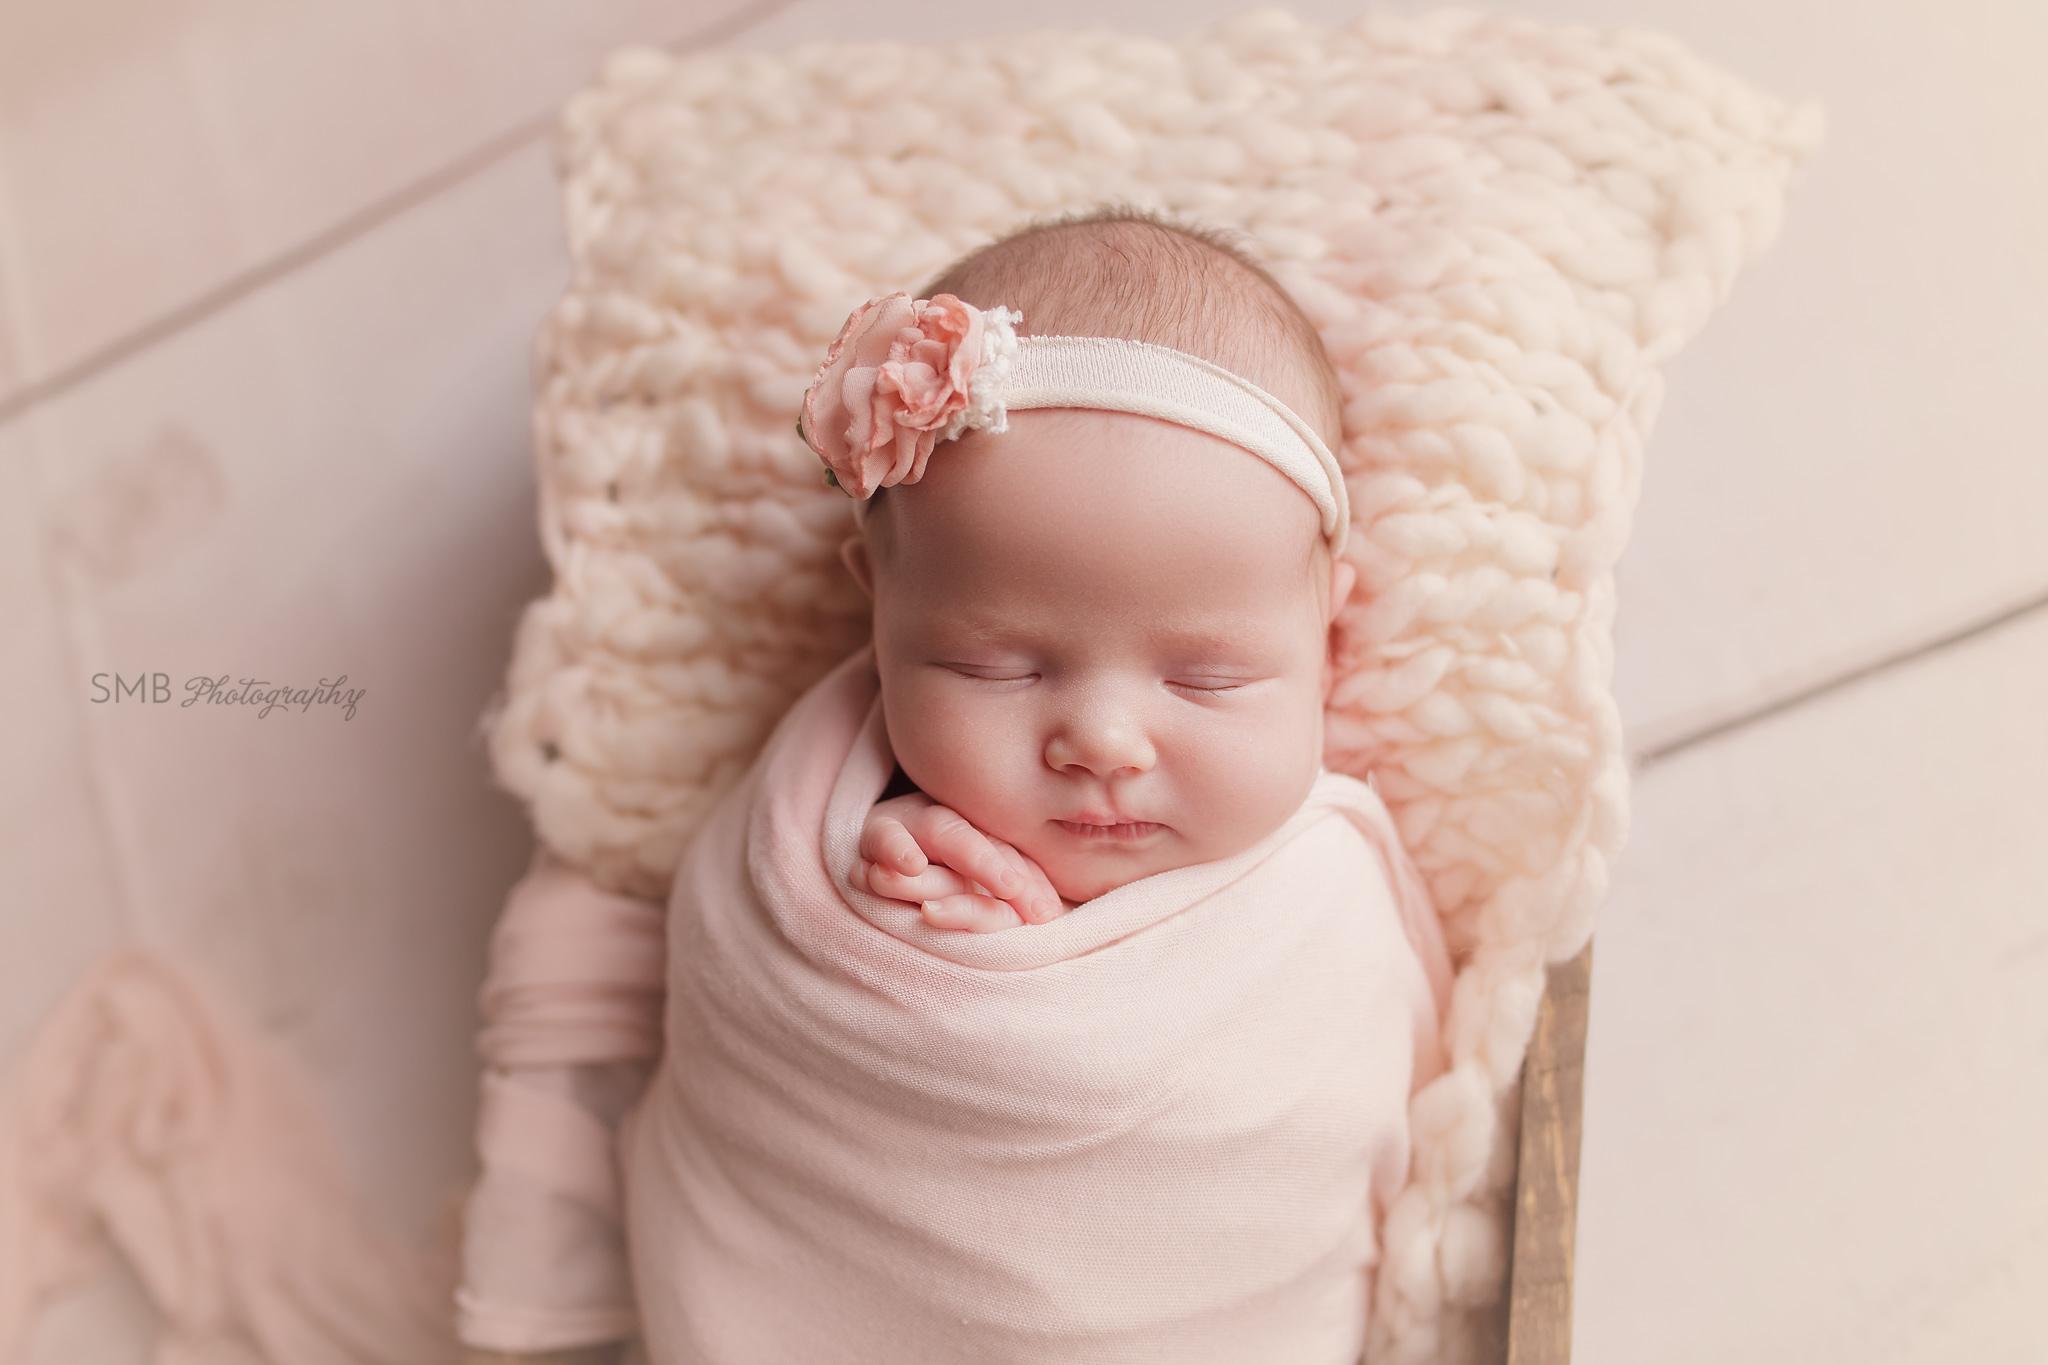 Newborn girl in wood box closeup of face